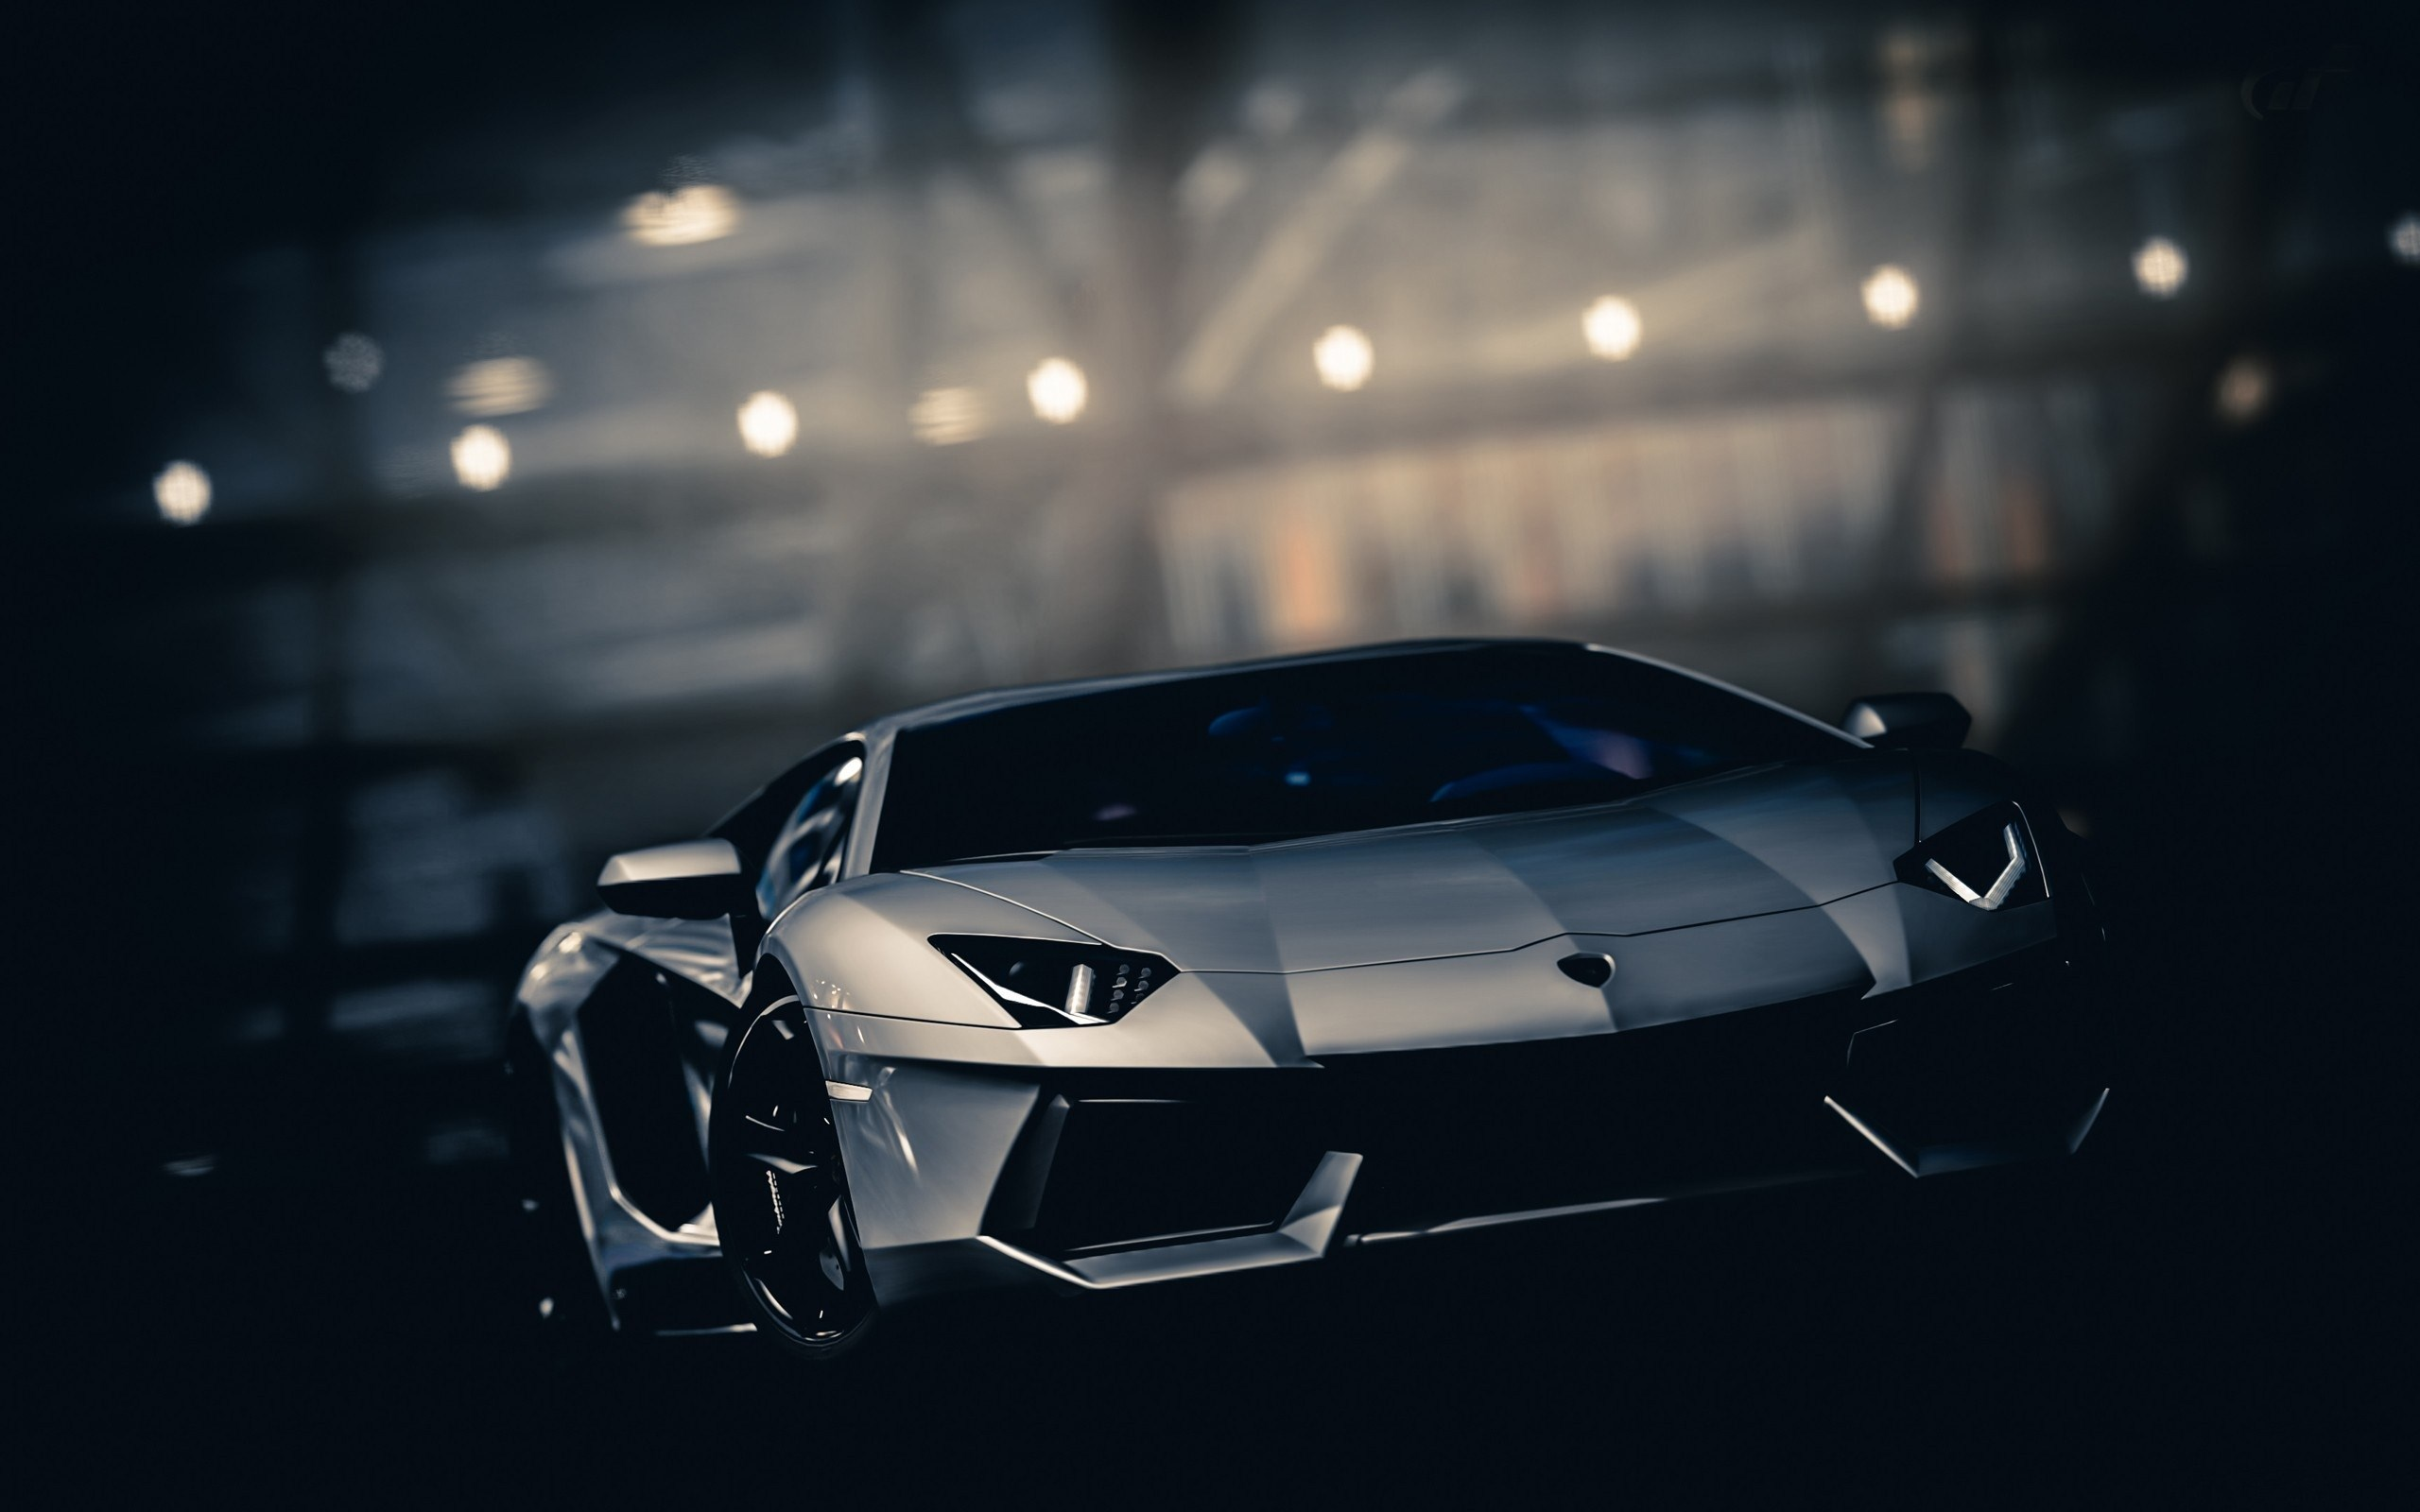 best images about Lamborghini Gallardo on Pinterest Cars Hip